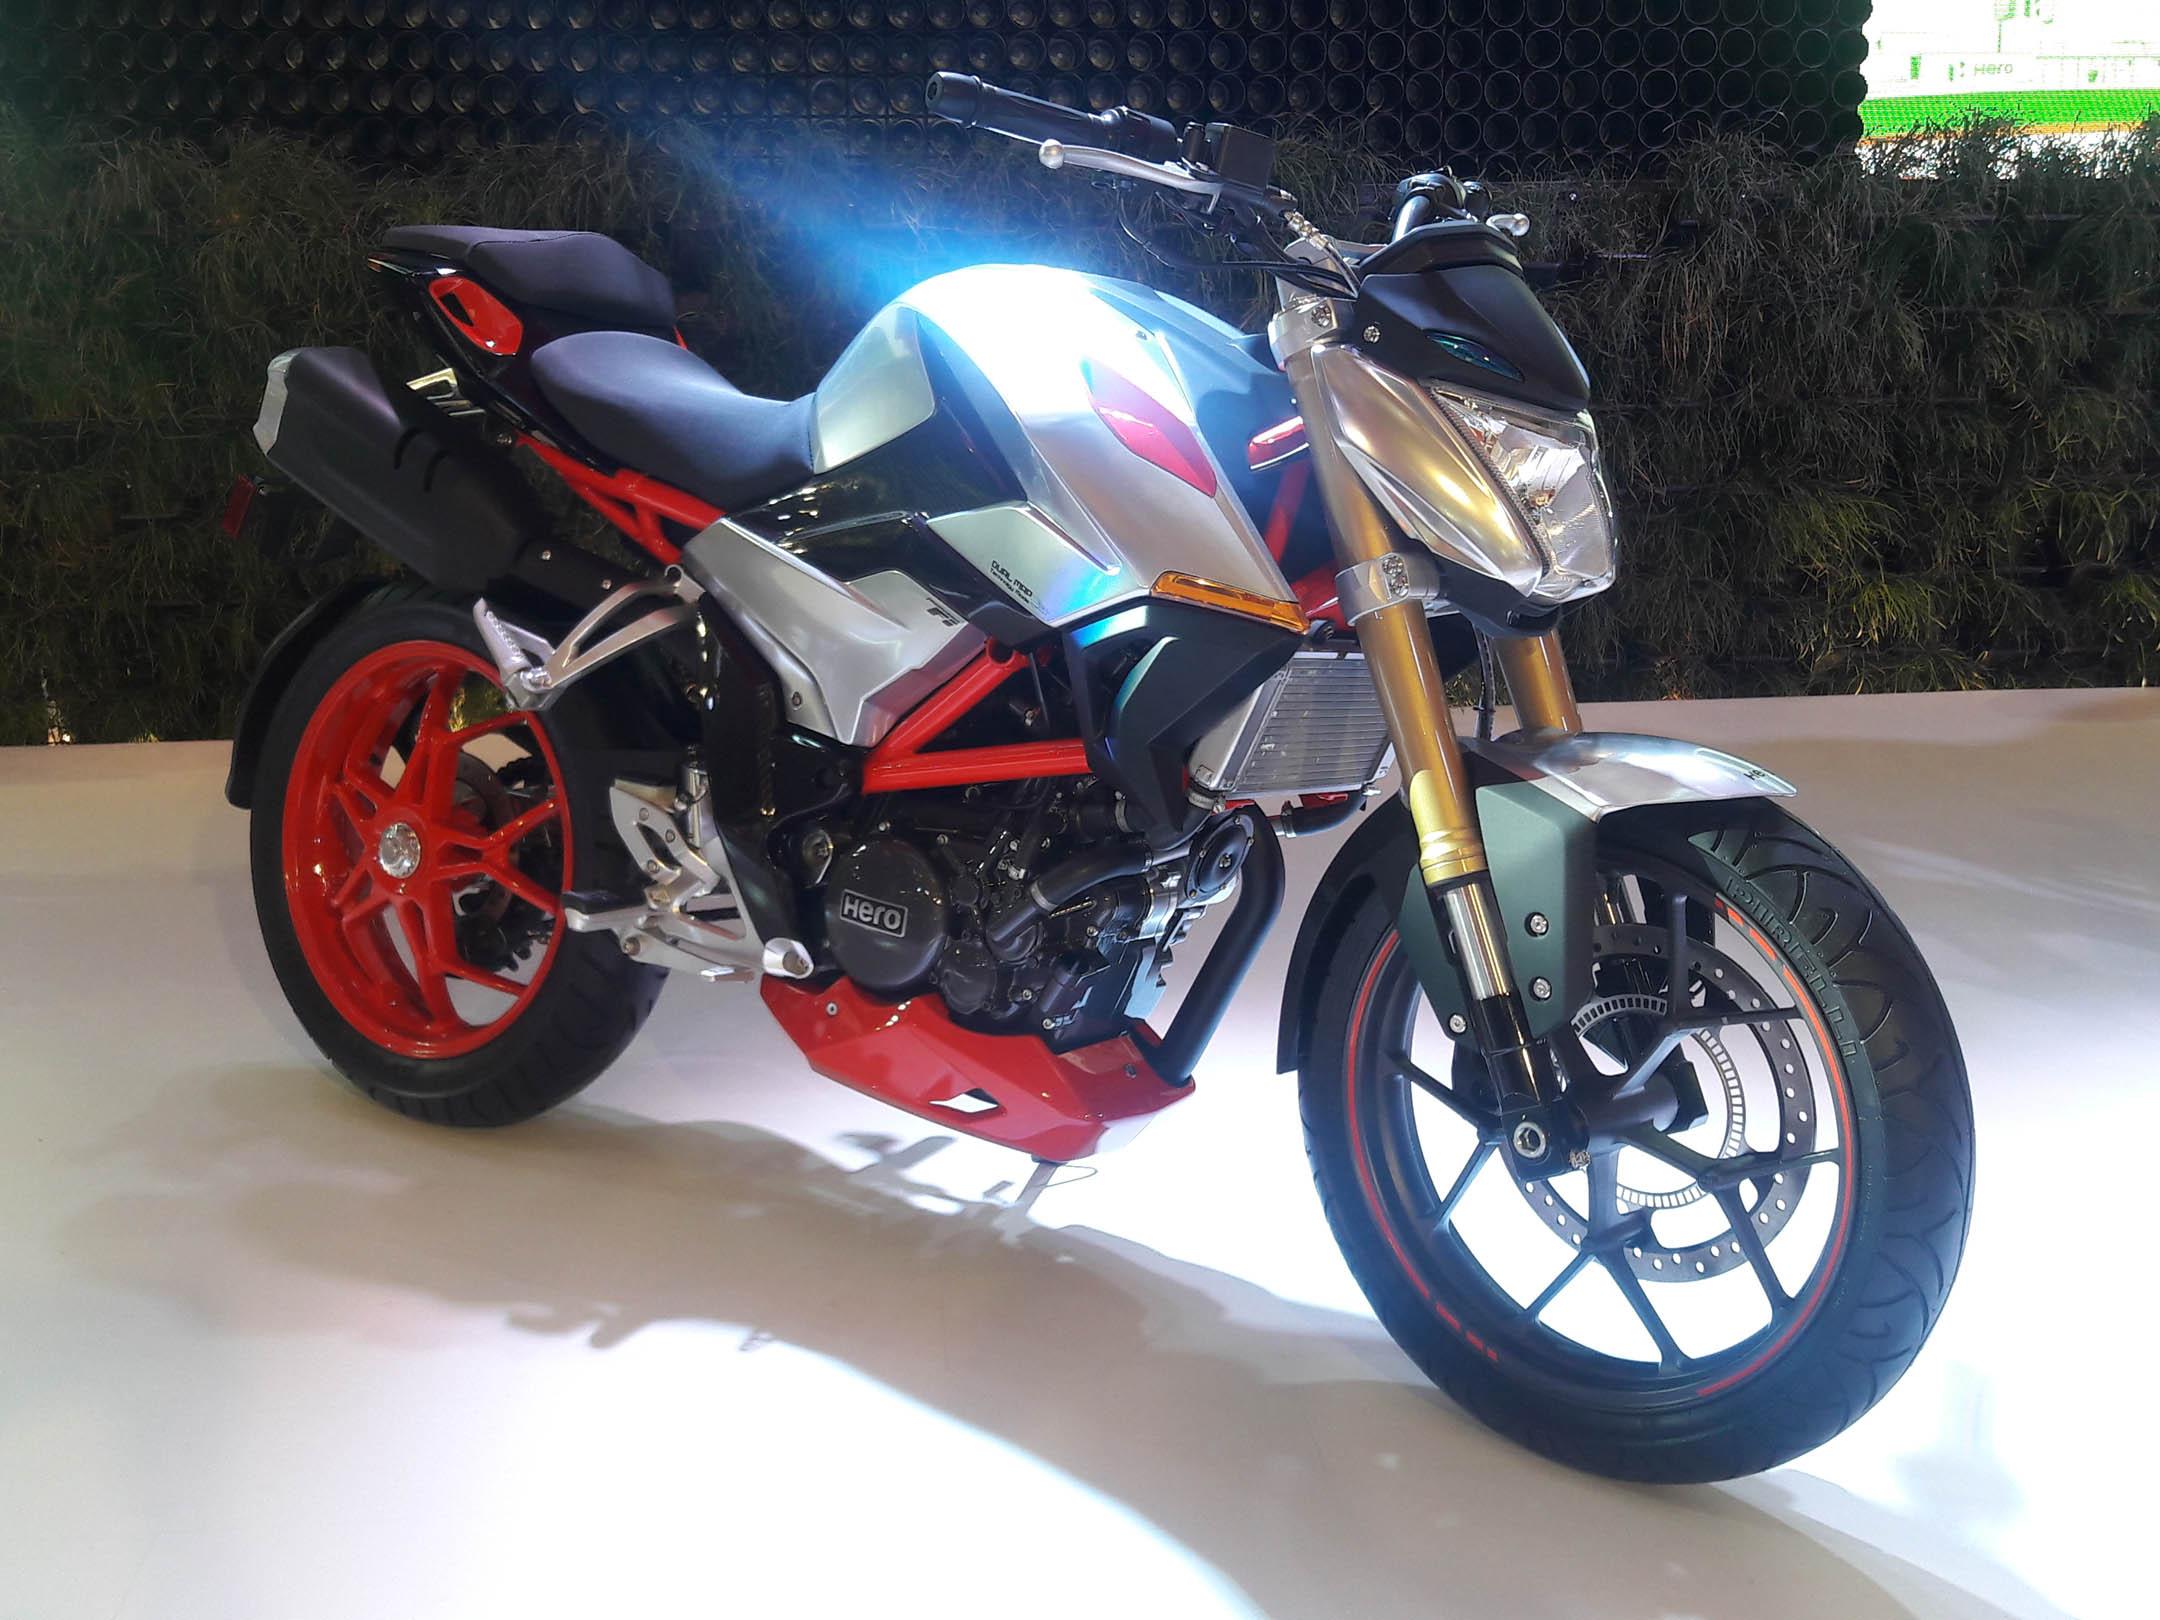 new 300cc hero motorcycle nearing production